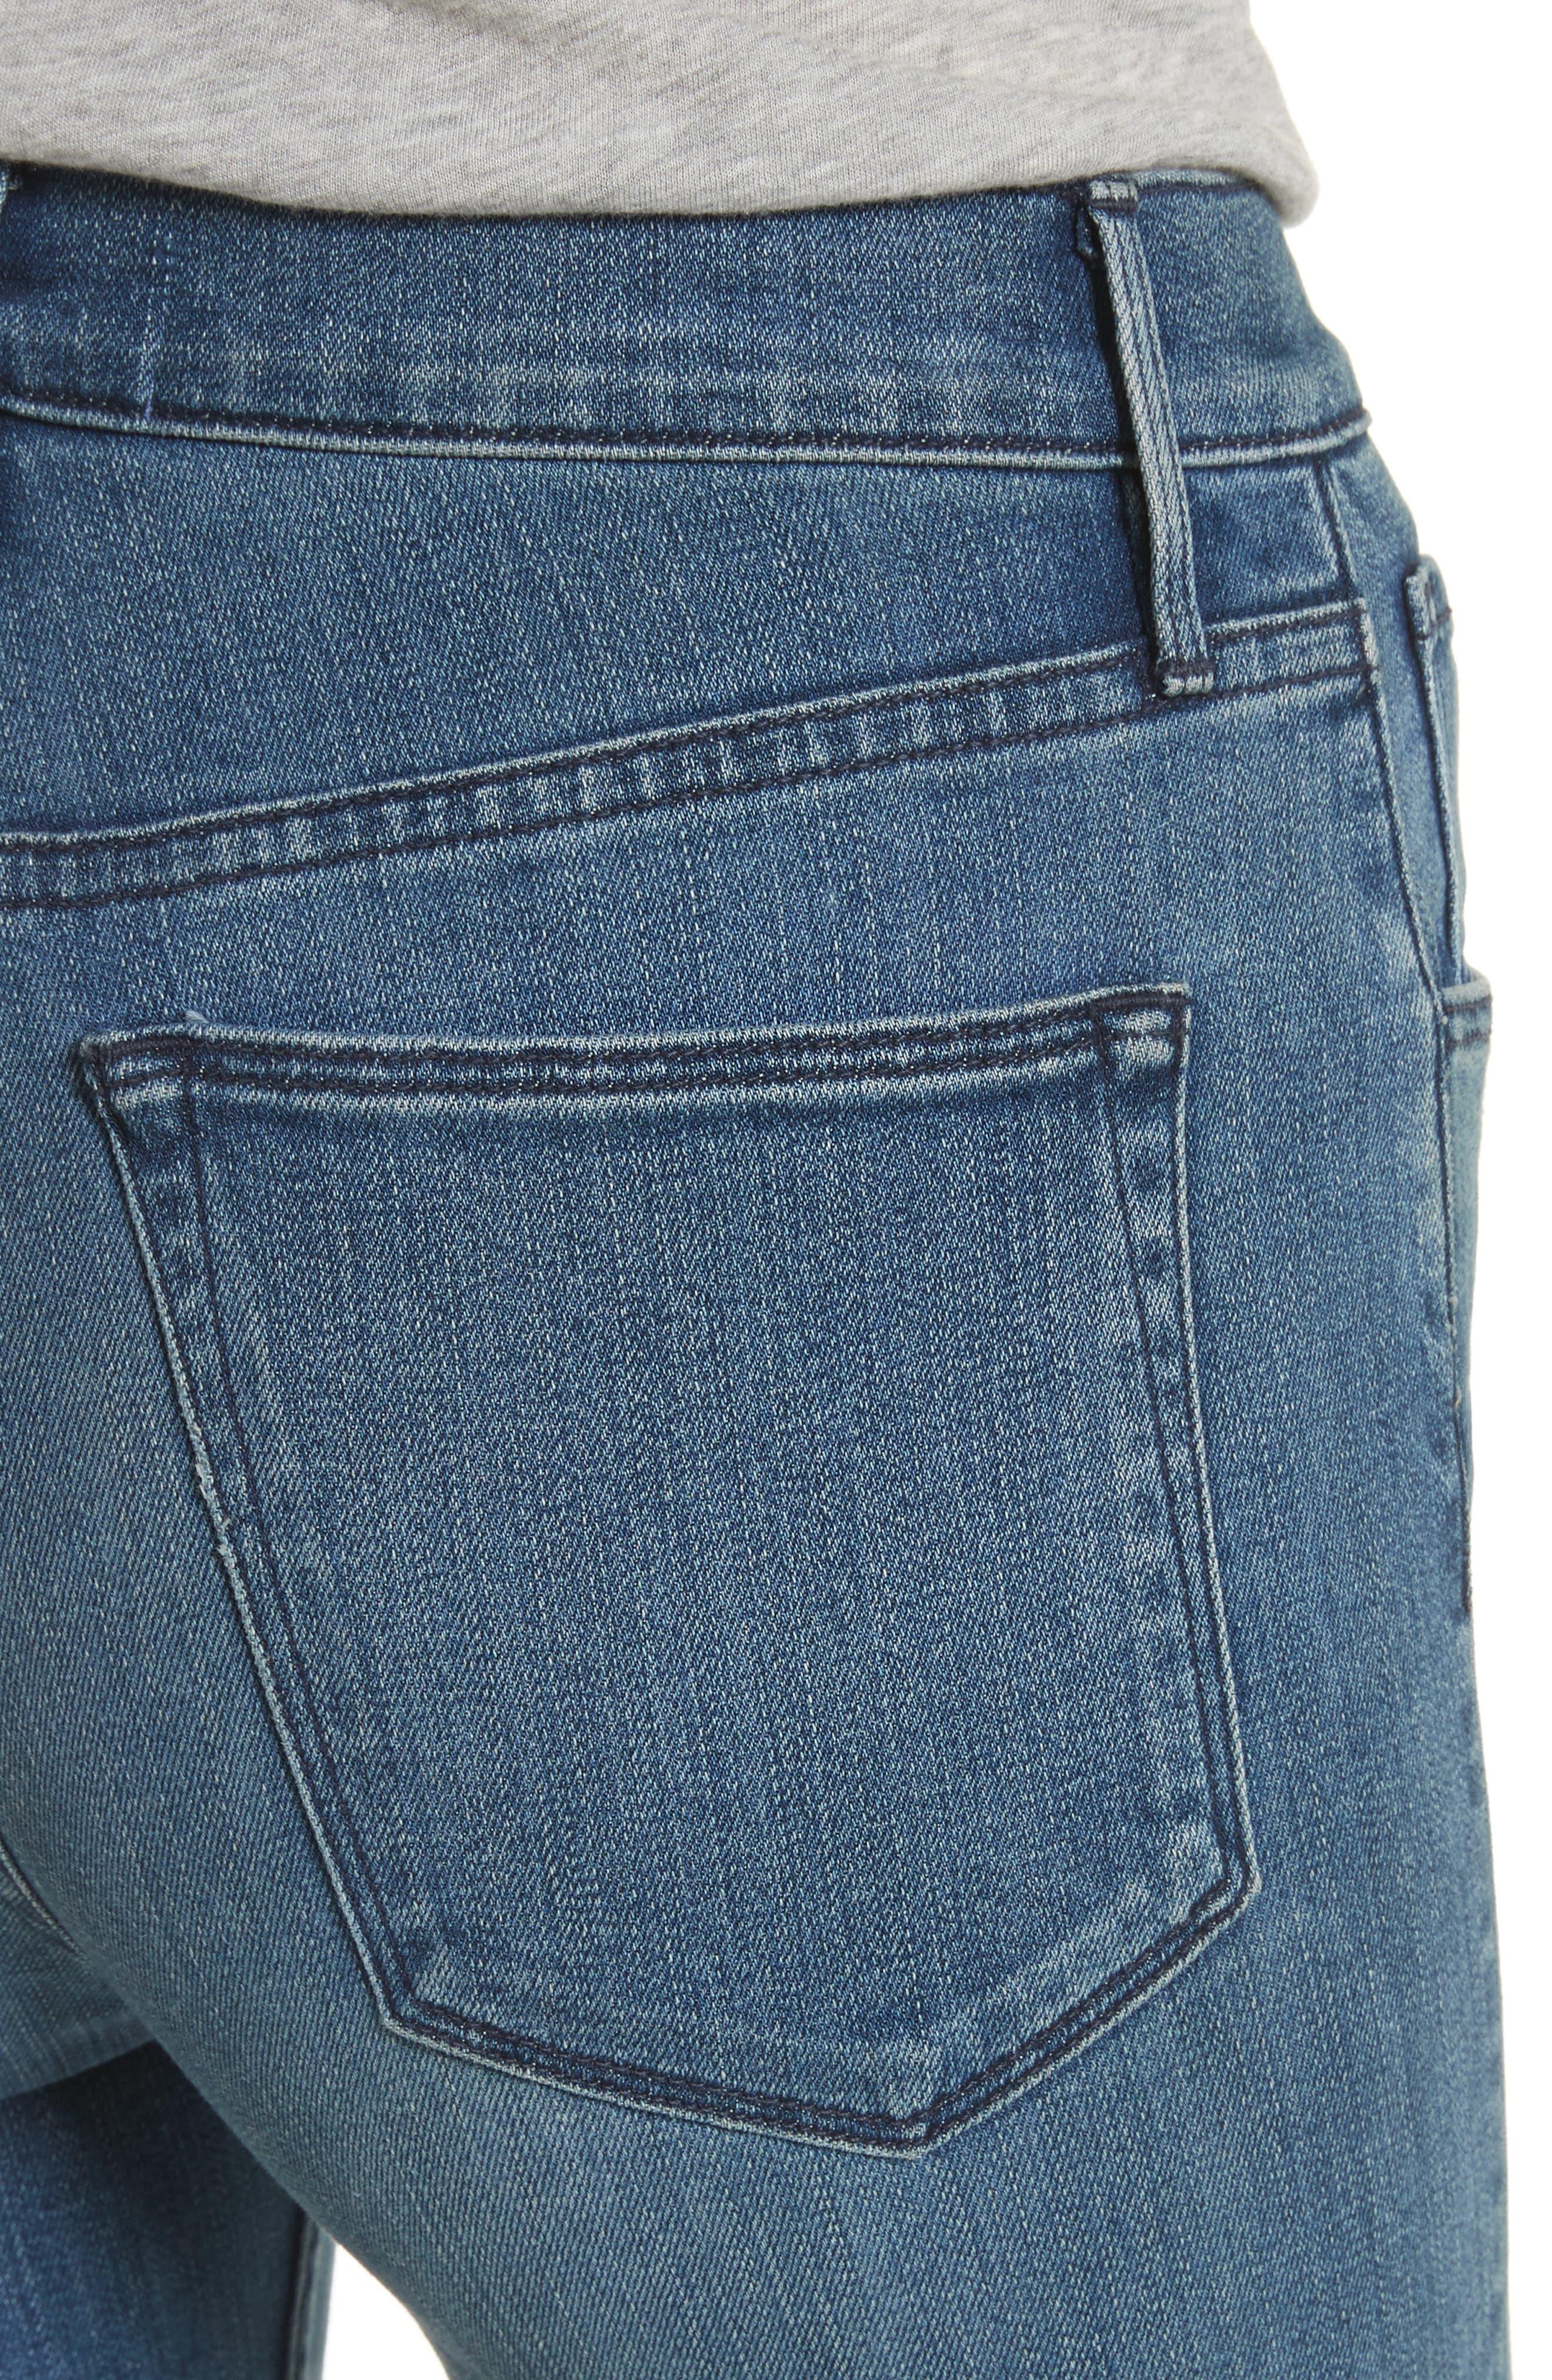 W4 Abigail Released Split Hem Ankle Skinny Jeans,                             Alternate thumbnail 4, color,                             ADY